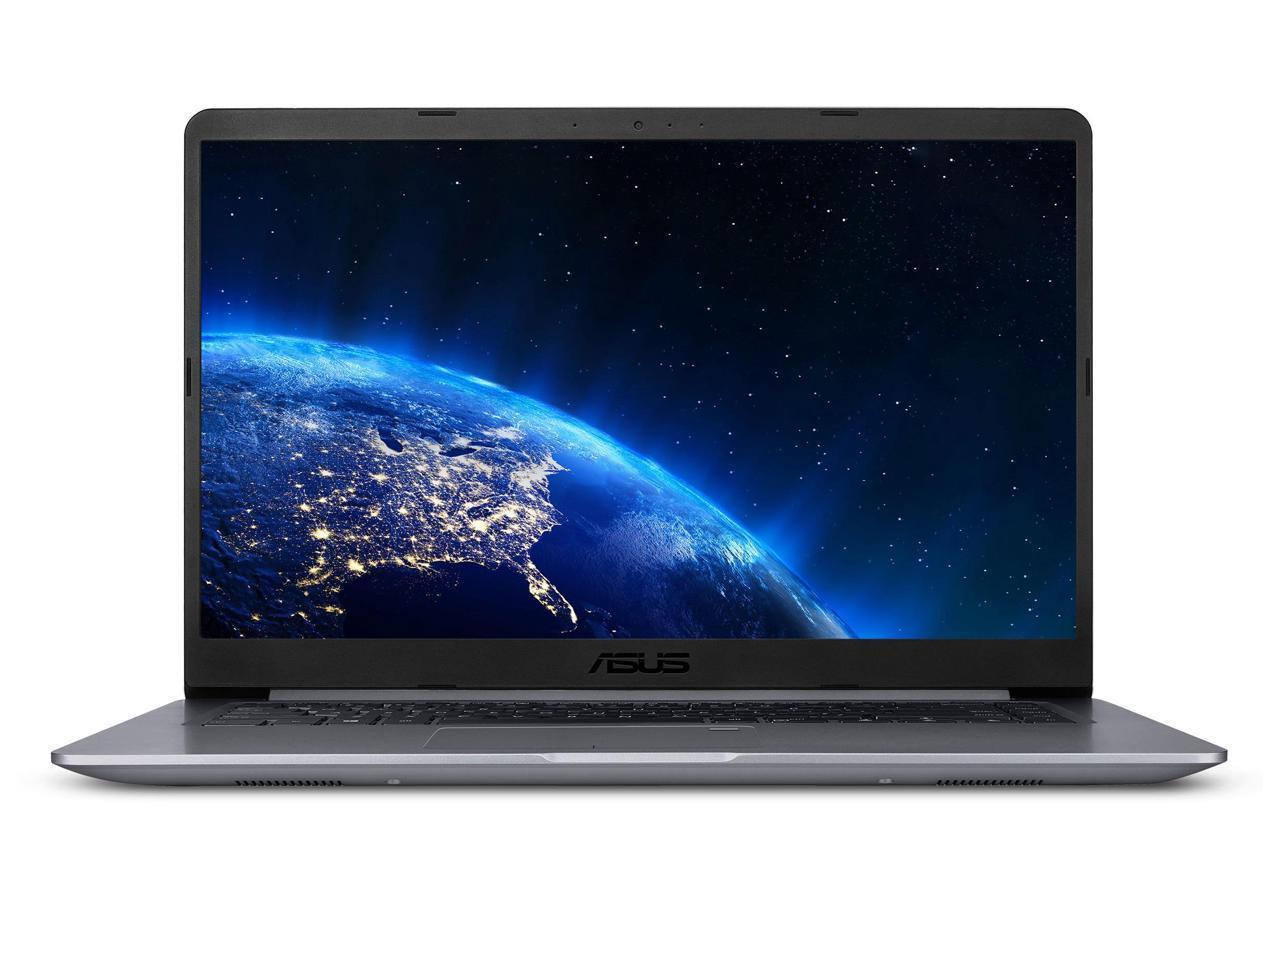 "(refurb) ASUS VivoBook F510QA Laptop: A12-9720p, 4GB DDR4, 128GB SSD, 15.6"" 1080p, Win 10 $200 + free s/h"